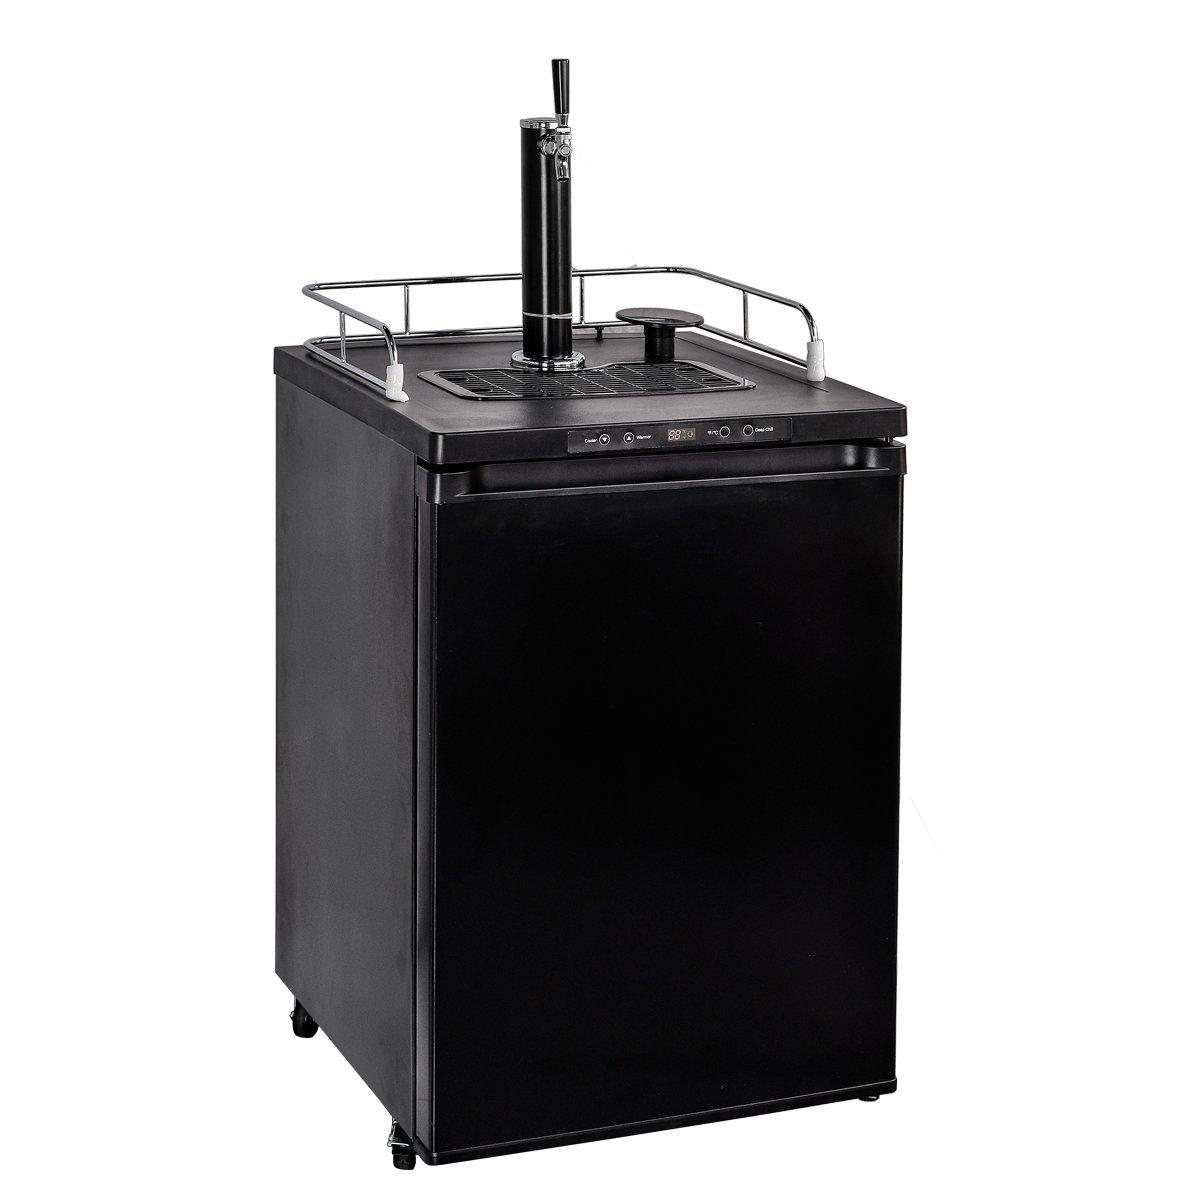 SMETA Full Size Keg Beer Cooler Refrigerator Kegerator Draft Beer Dispenser with Digital Display,5.6 Cu ft,Black